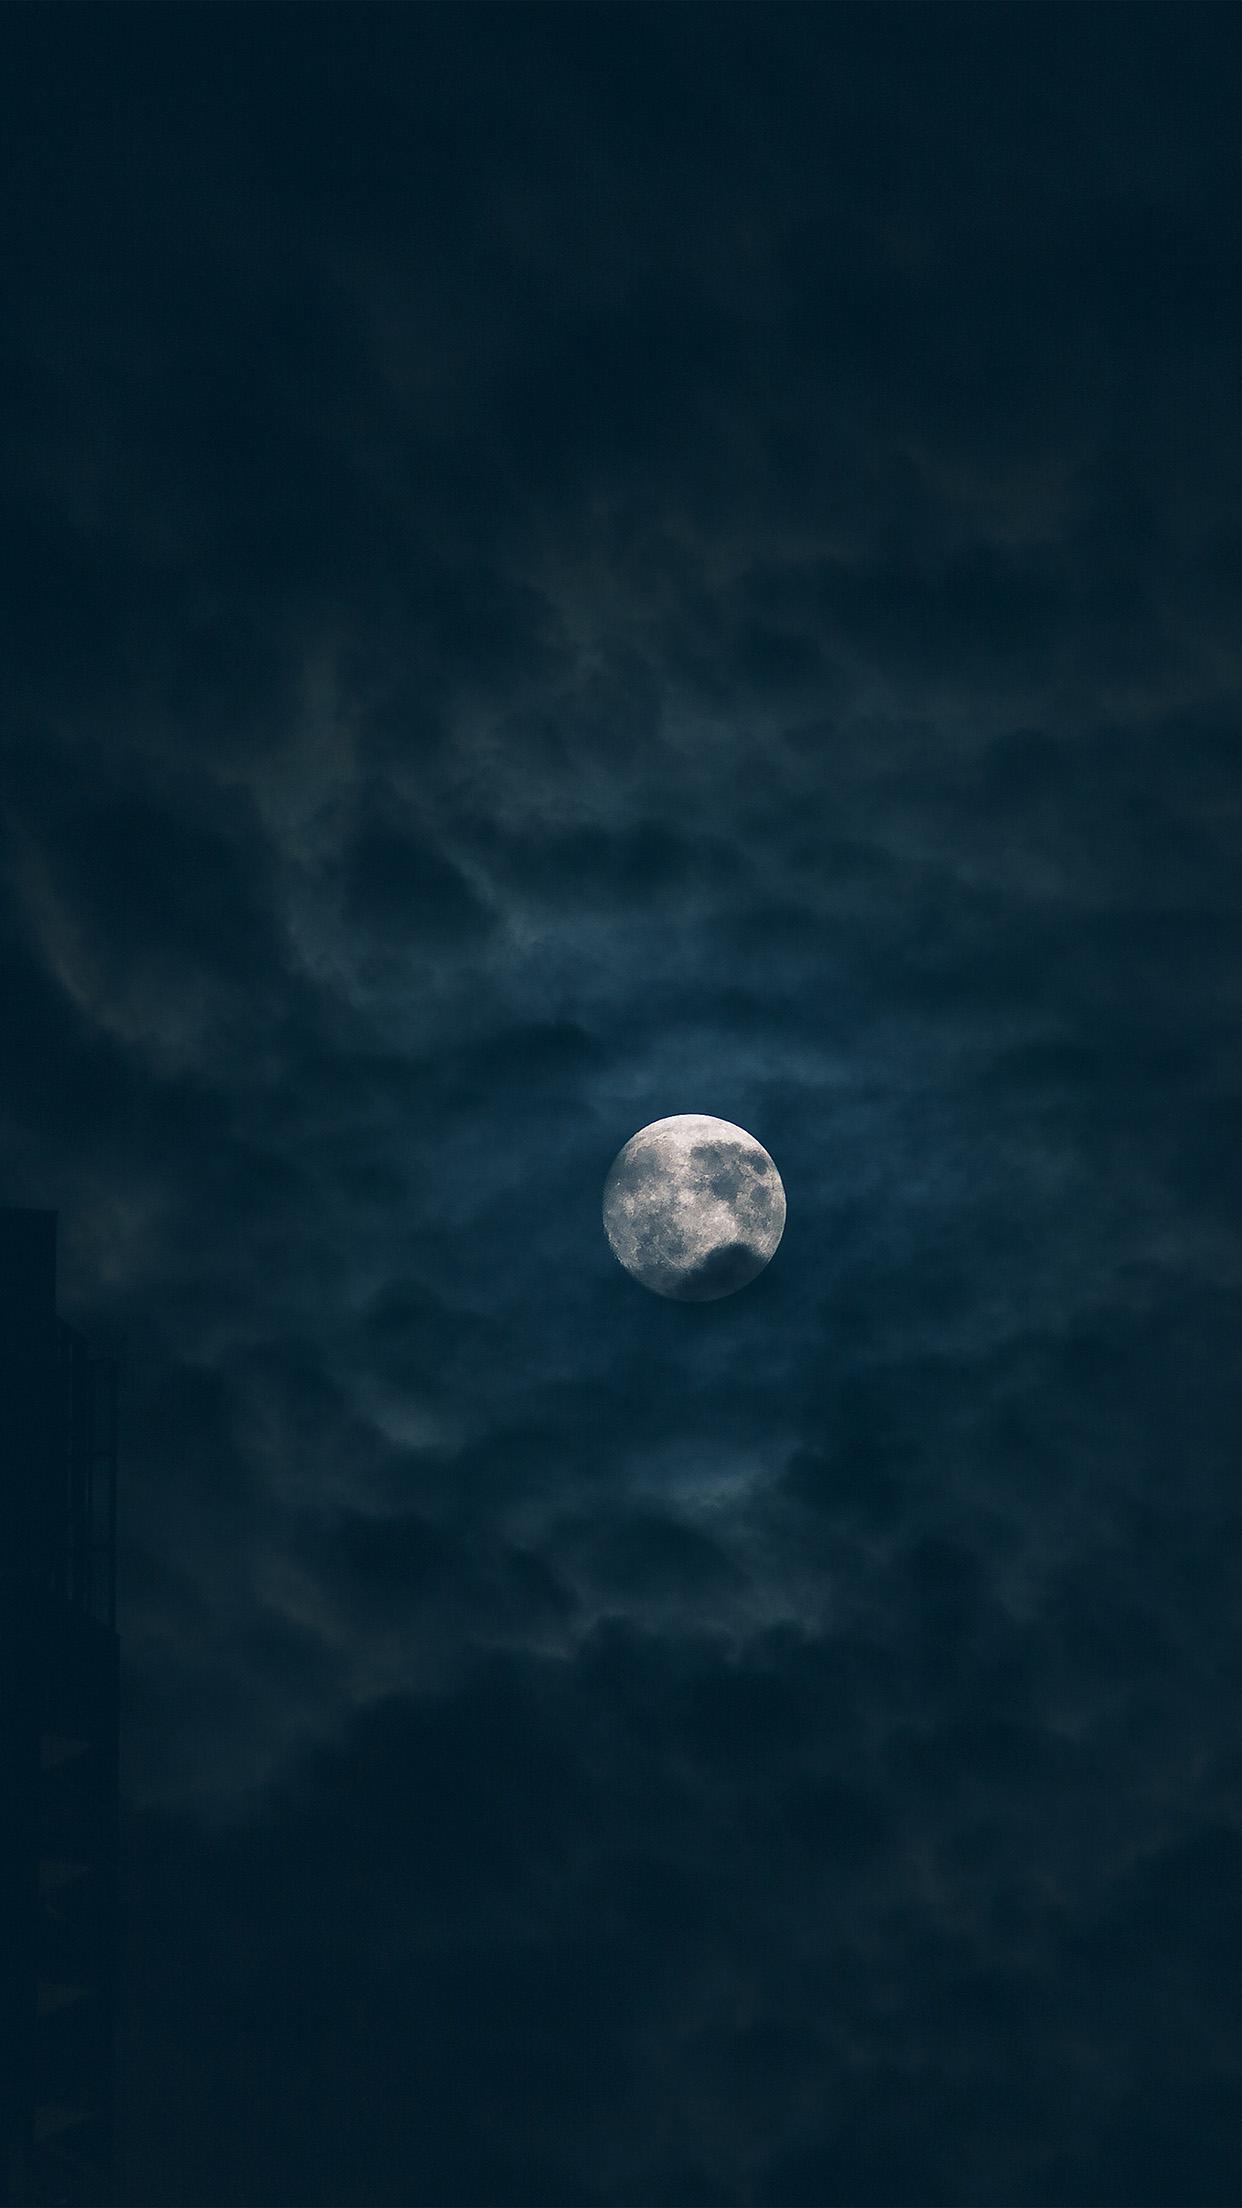 Iphone7papers Com Iphone7 Wallpaper Ng20 Moon Sky Dark